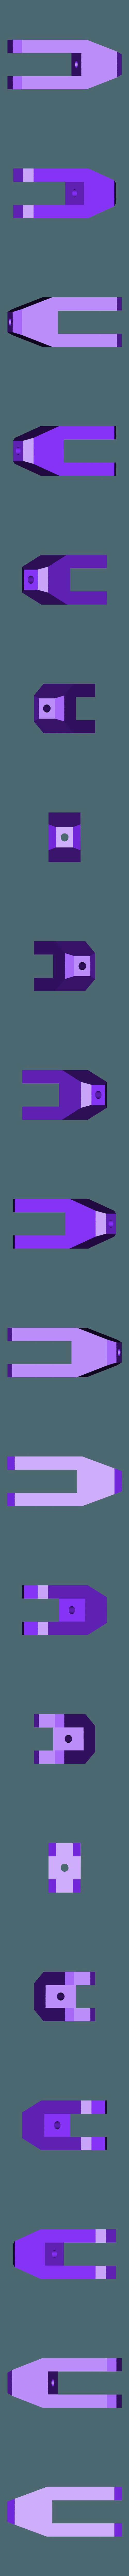 QWICK_SERVO_Short.stl Download free OBJ file Thick Horn and qwick´s LIDL • 3D printer design, PaulDrones